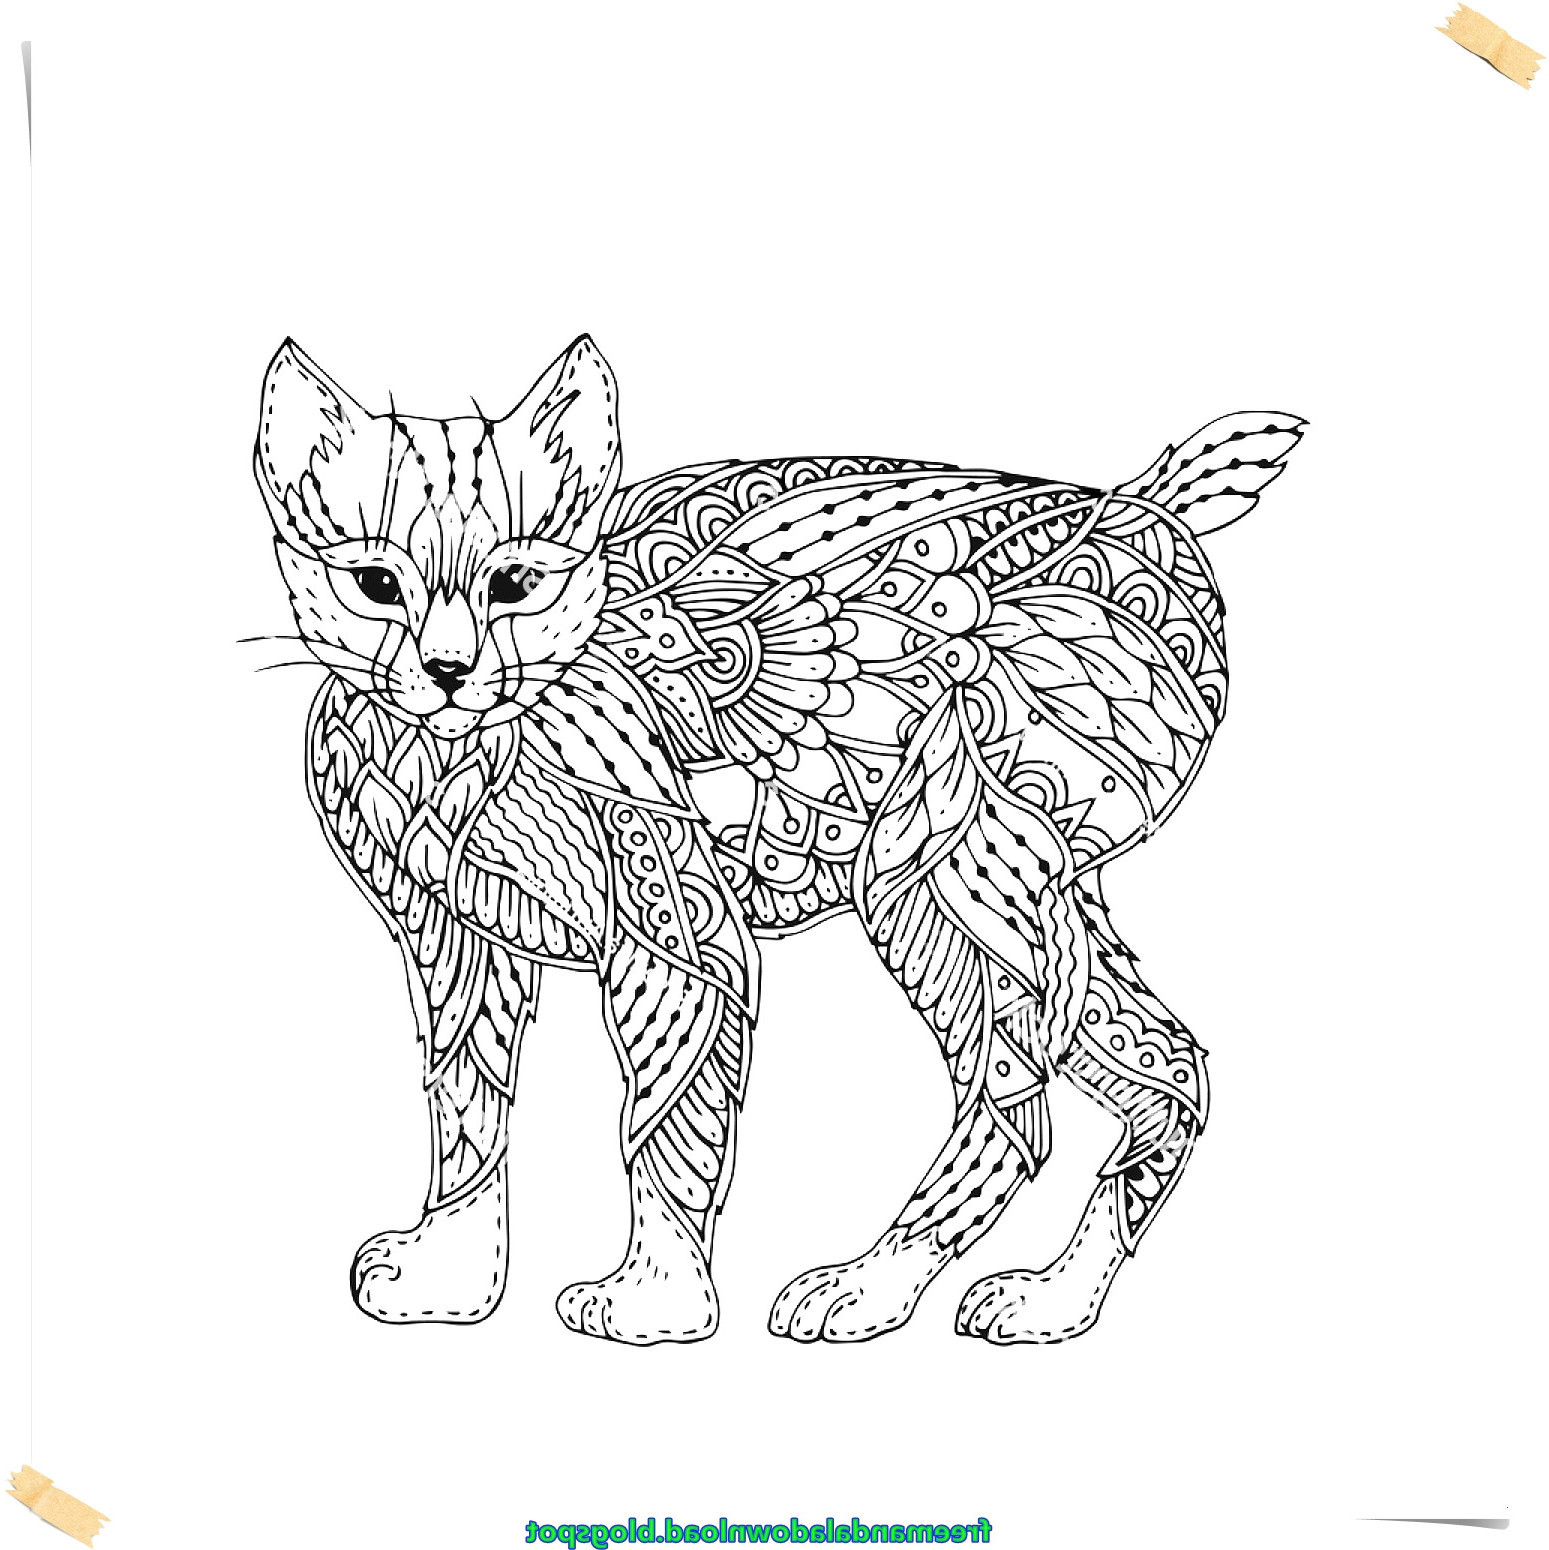 Ausmalbilder Mandala Herzen Das Beste Von 27 Neu Katzen Ausmalbilder – Malvorlagen Ideen Fotografieren